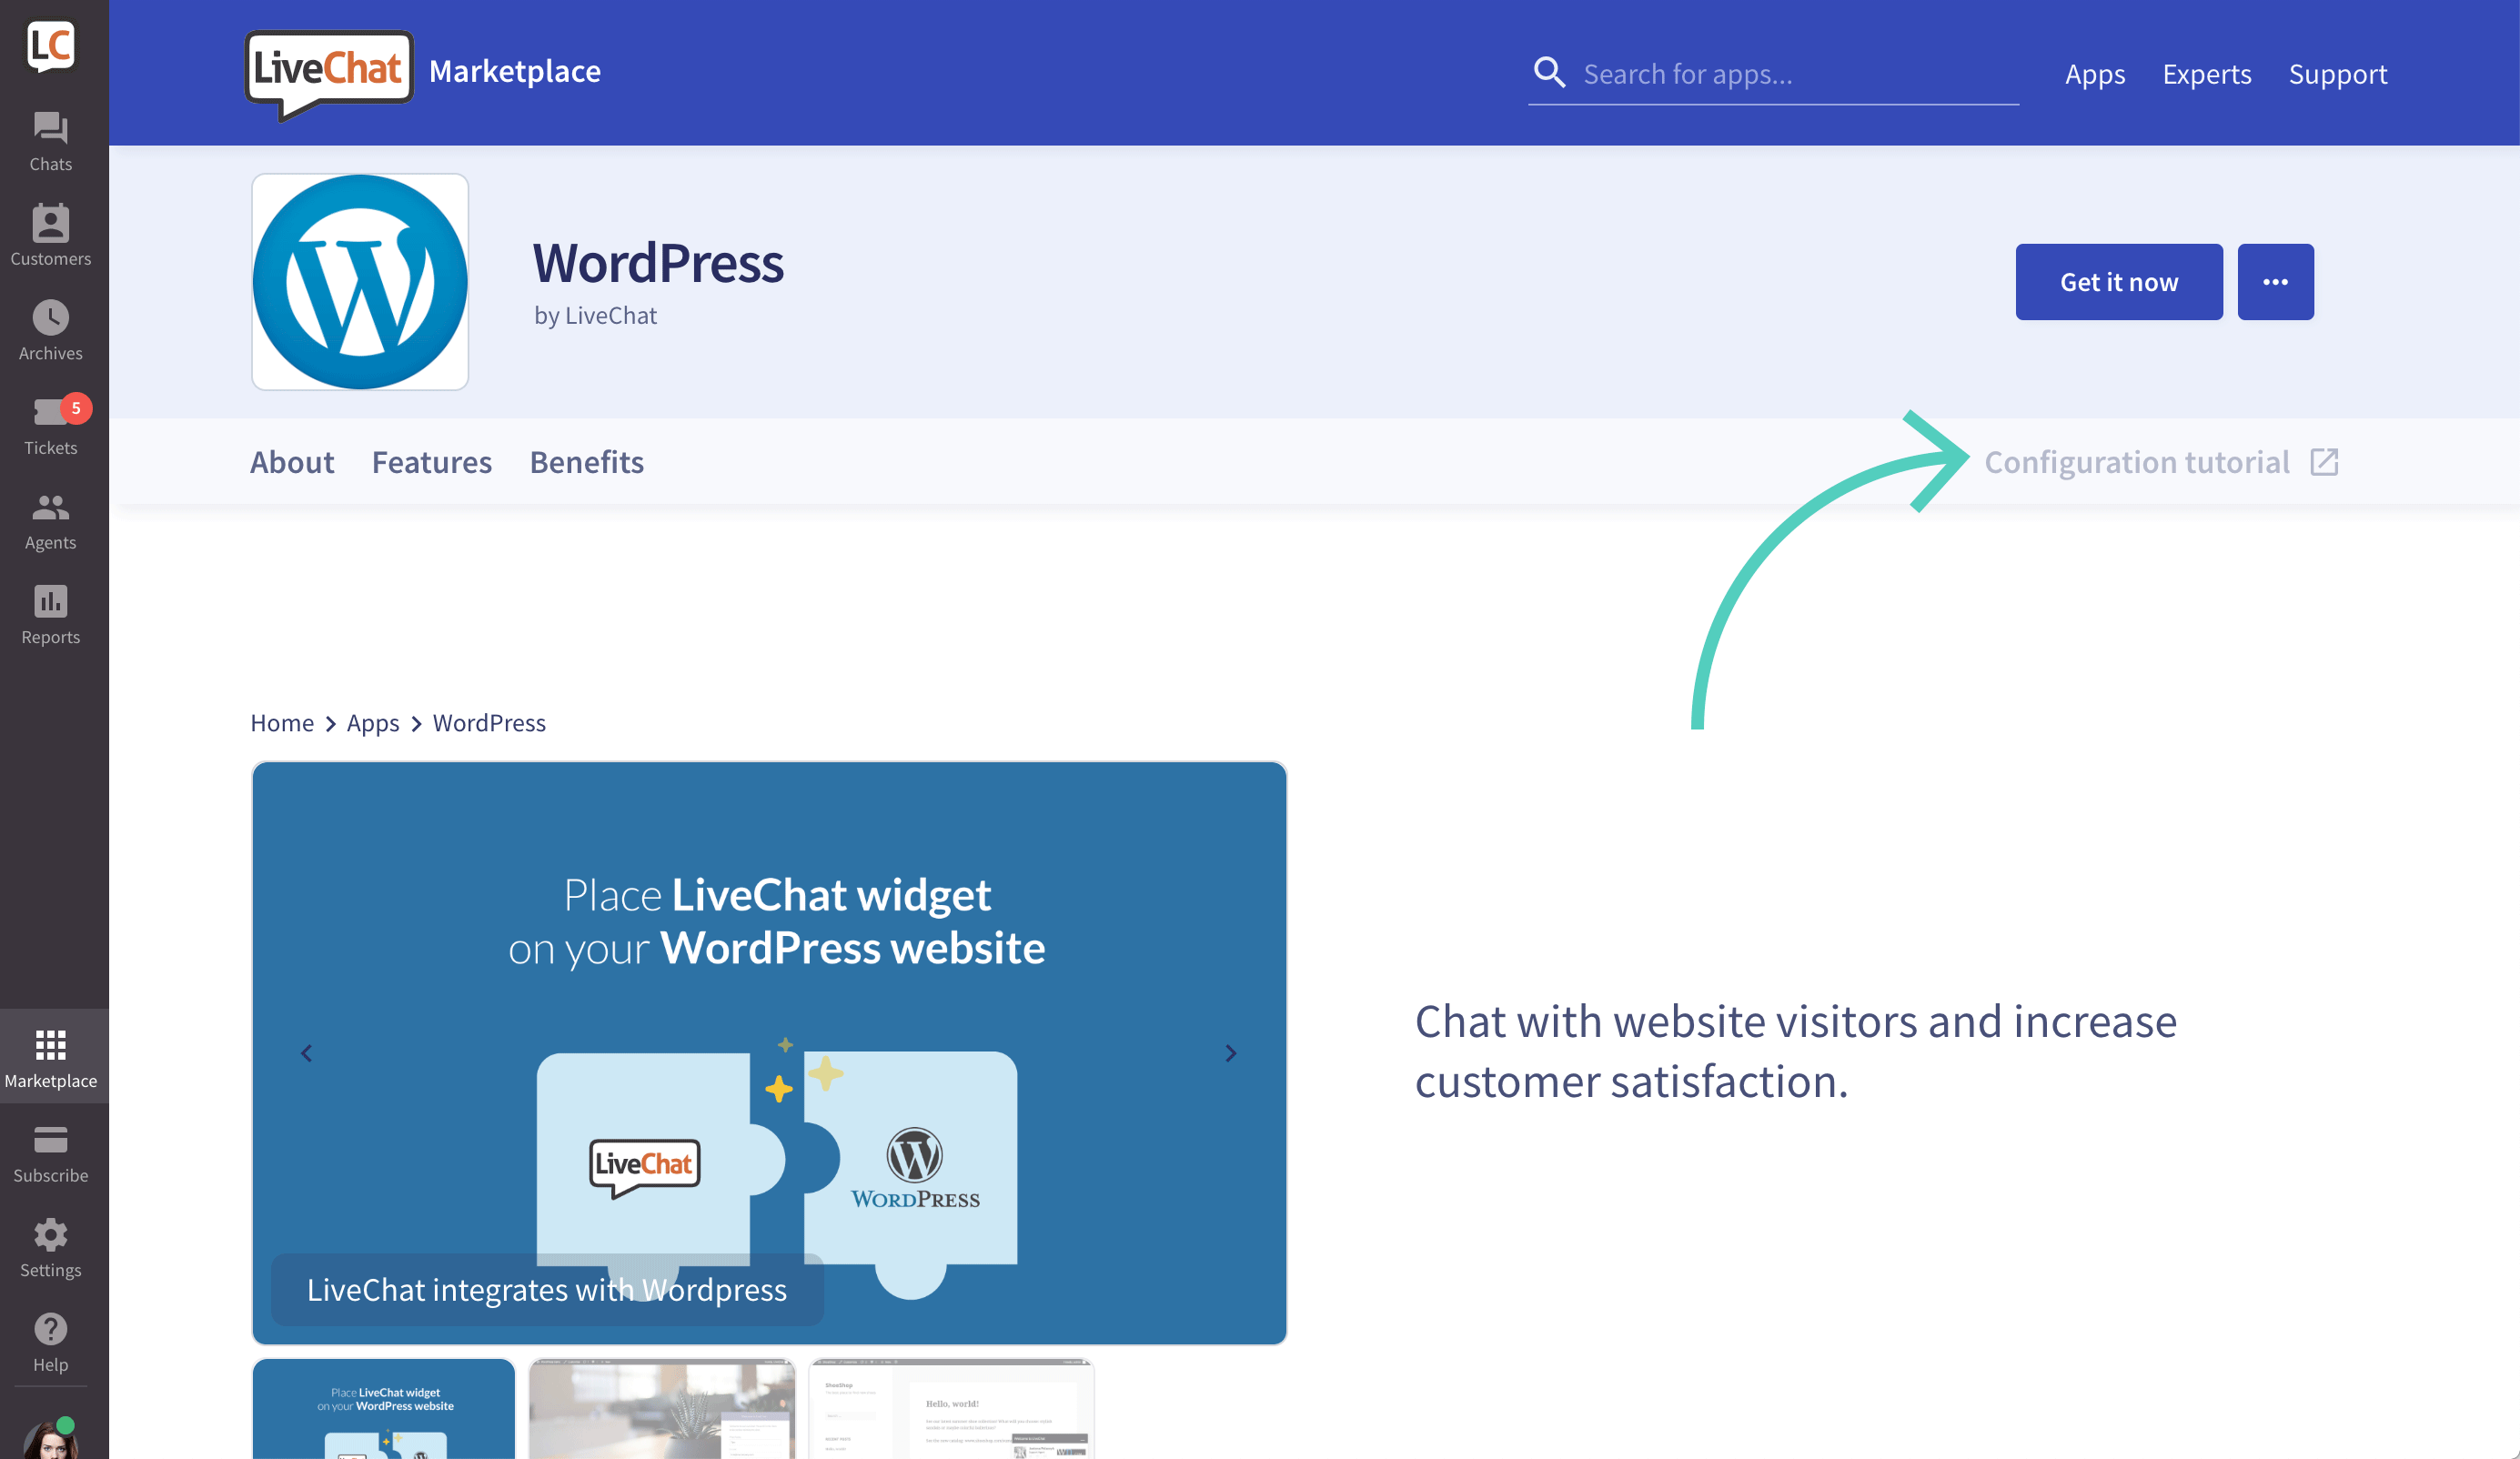 LiveChat integration configuration tutorial